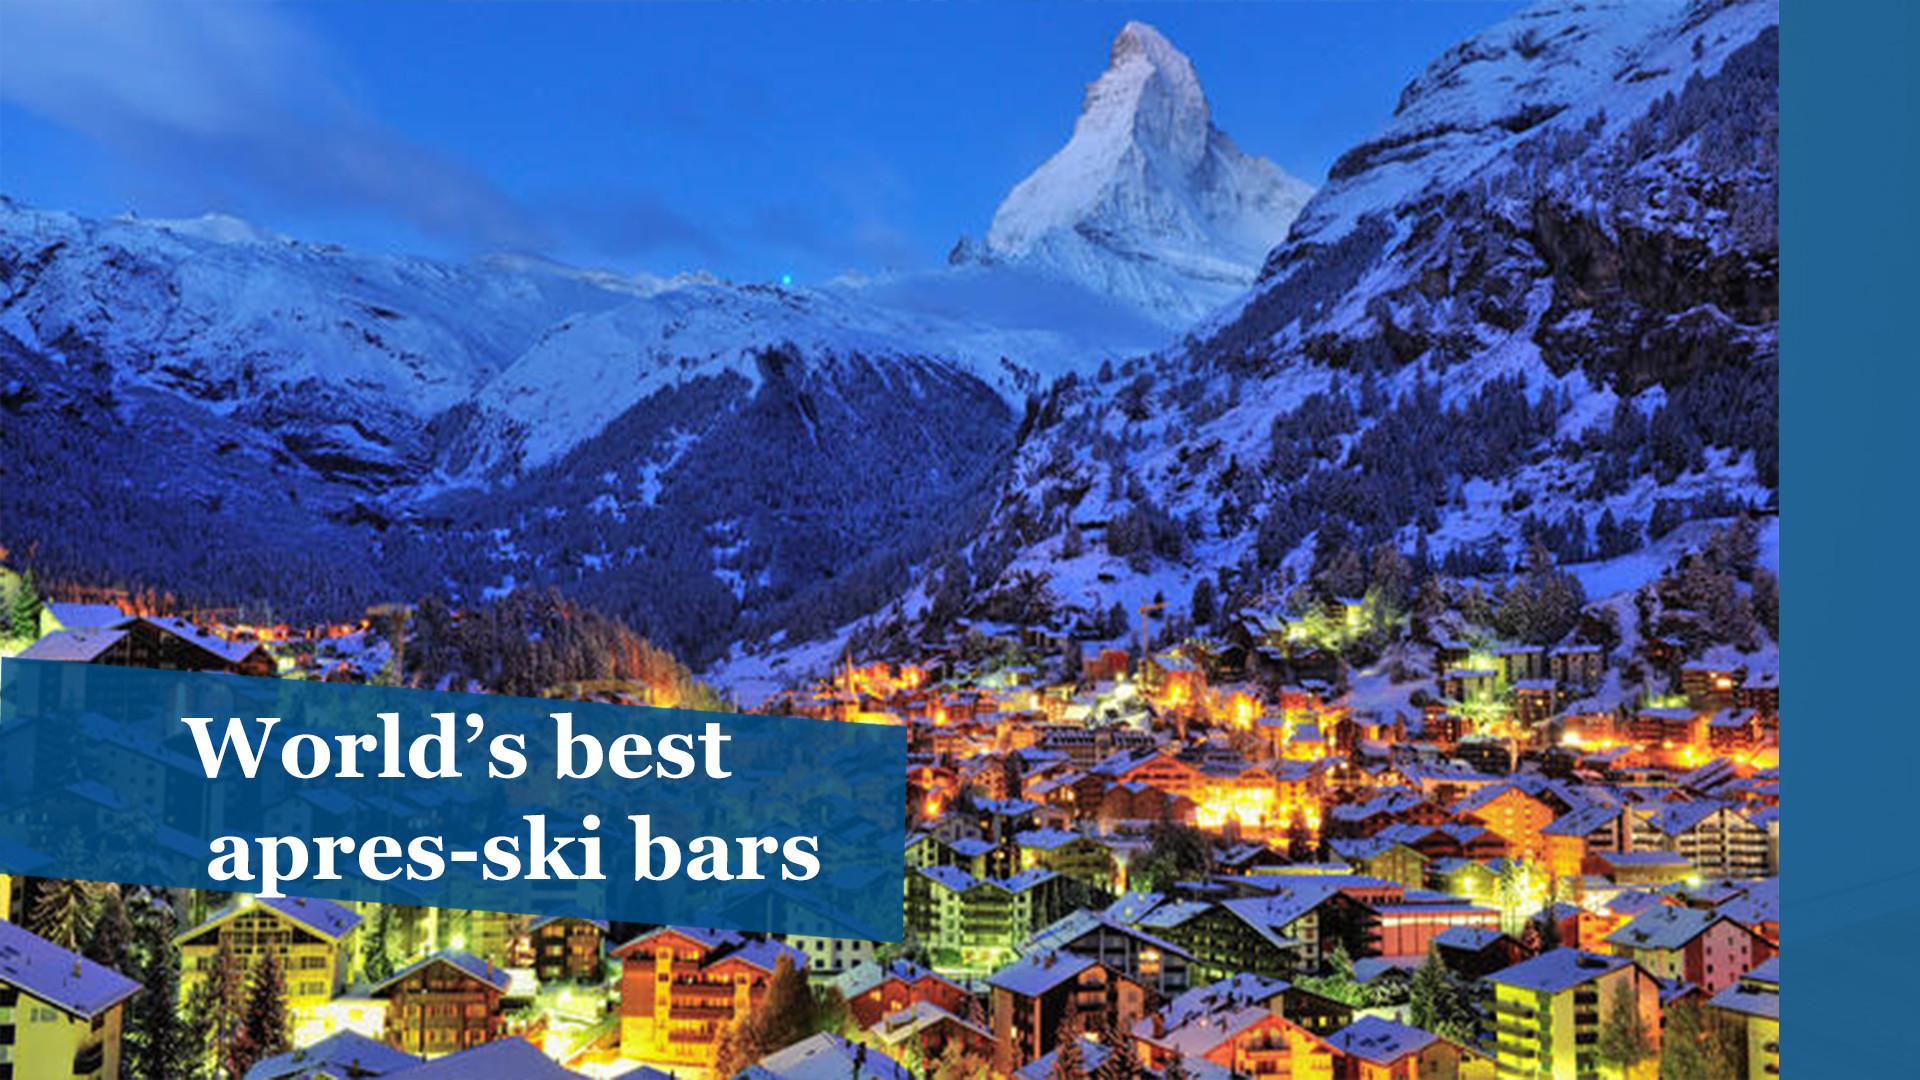 Photos: World's best après-ski bars